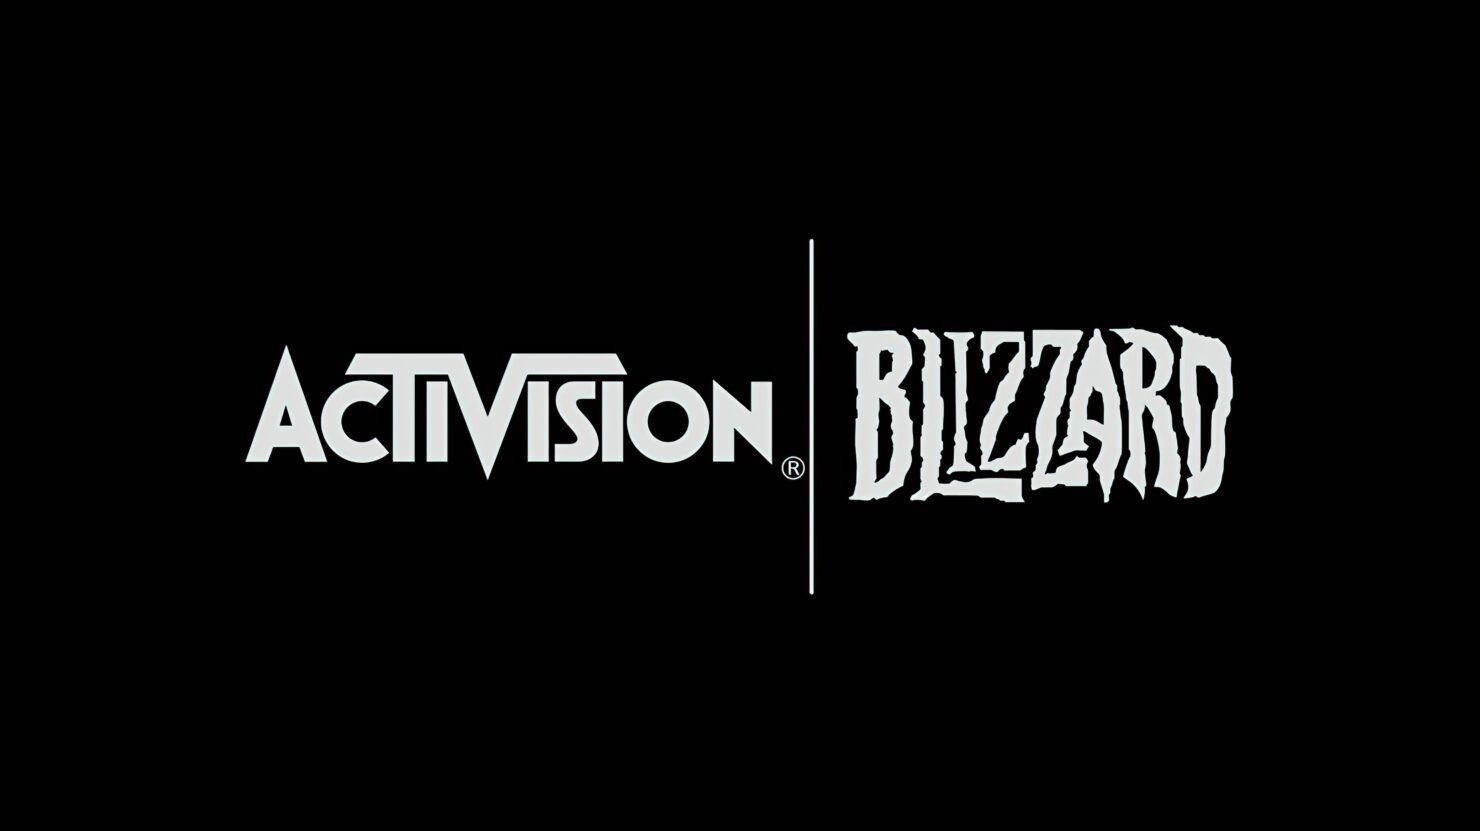 Activision Blizzard game development